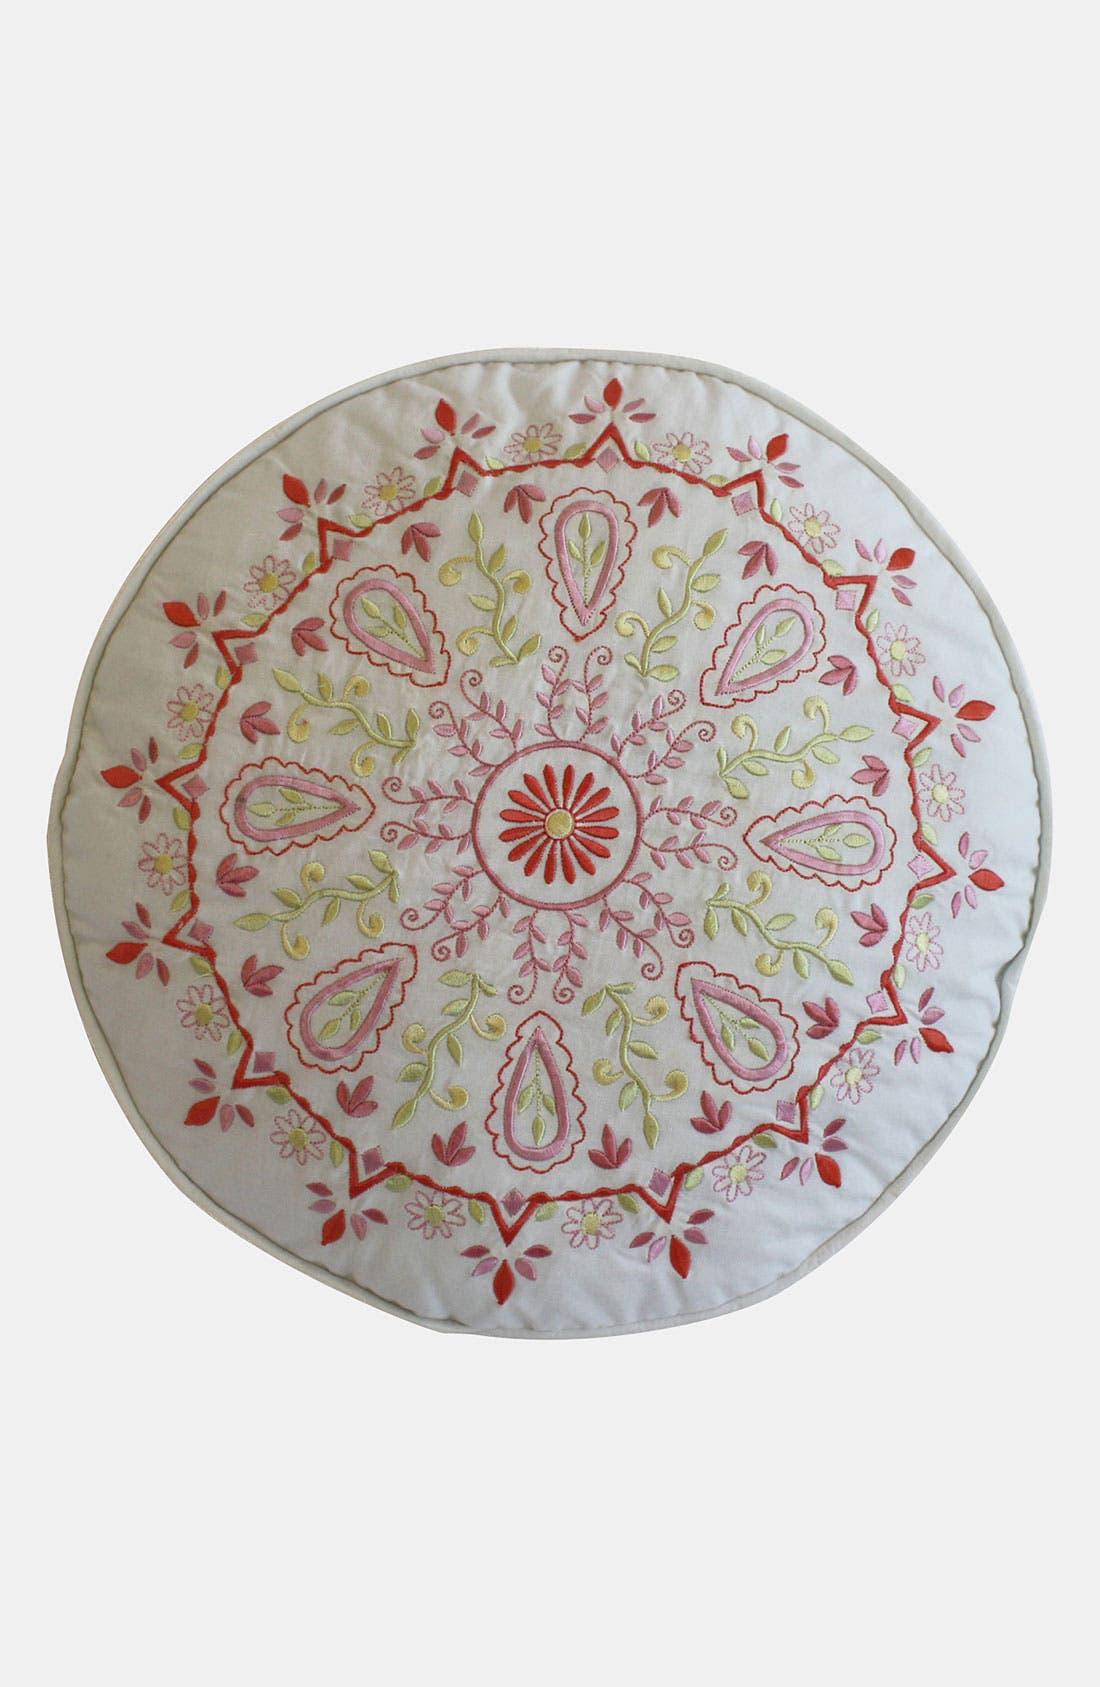 Alternate Image 1 Selected - Dena Home 'Dream Nest' Round Pillow